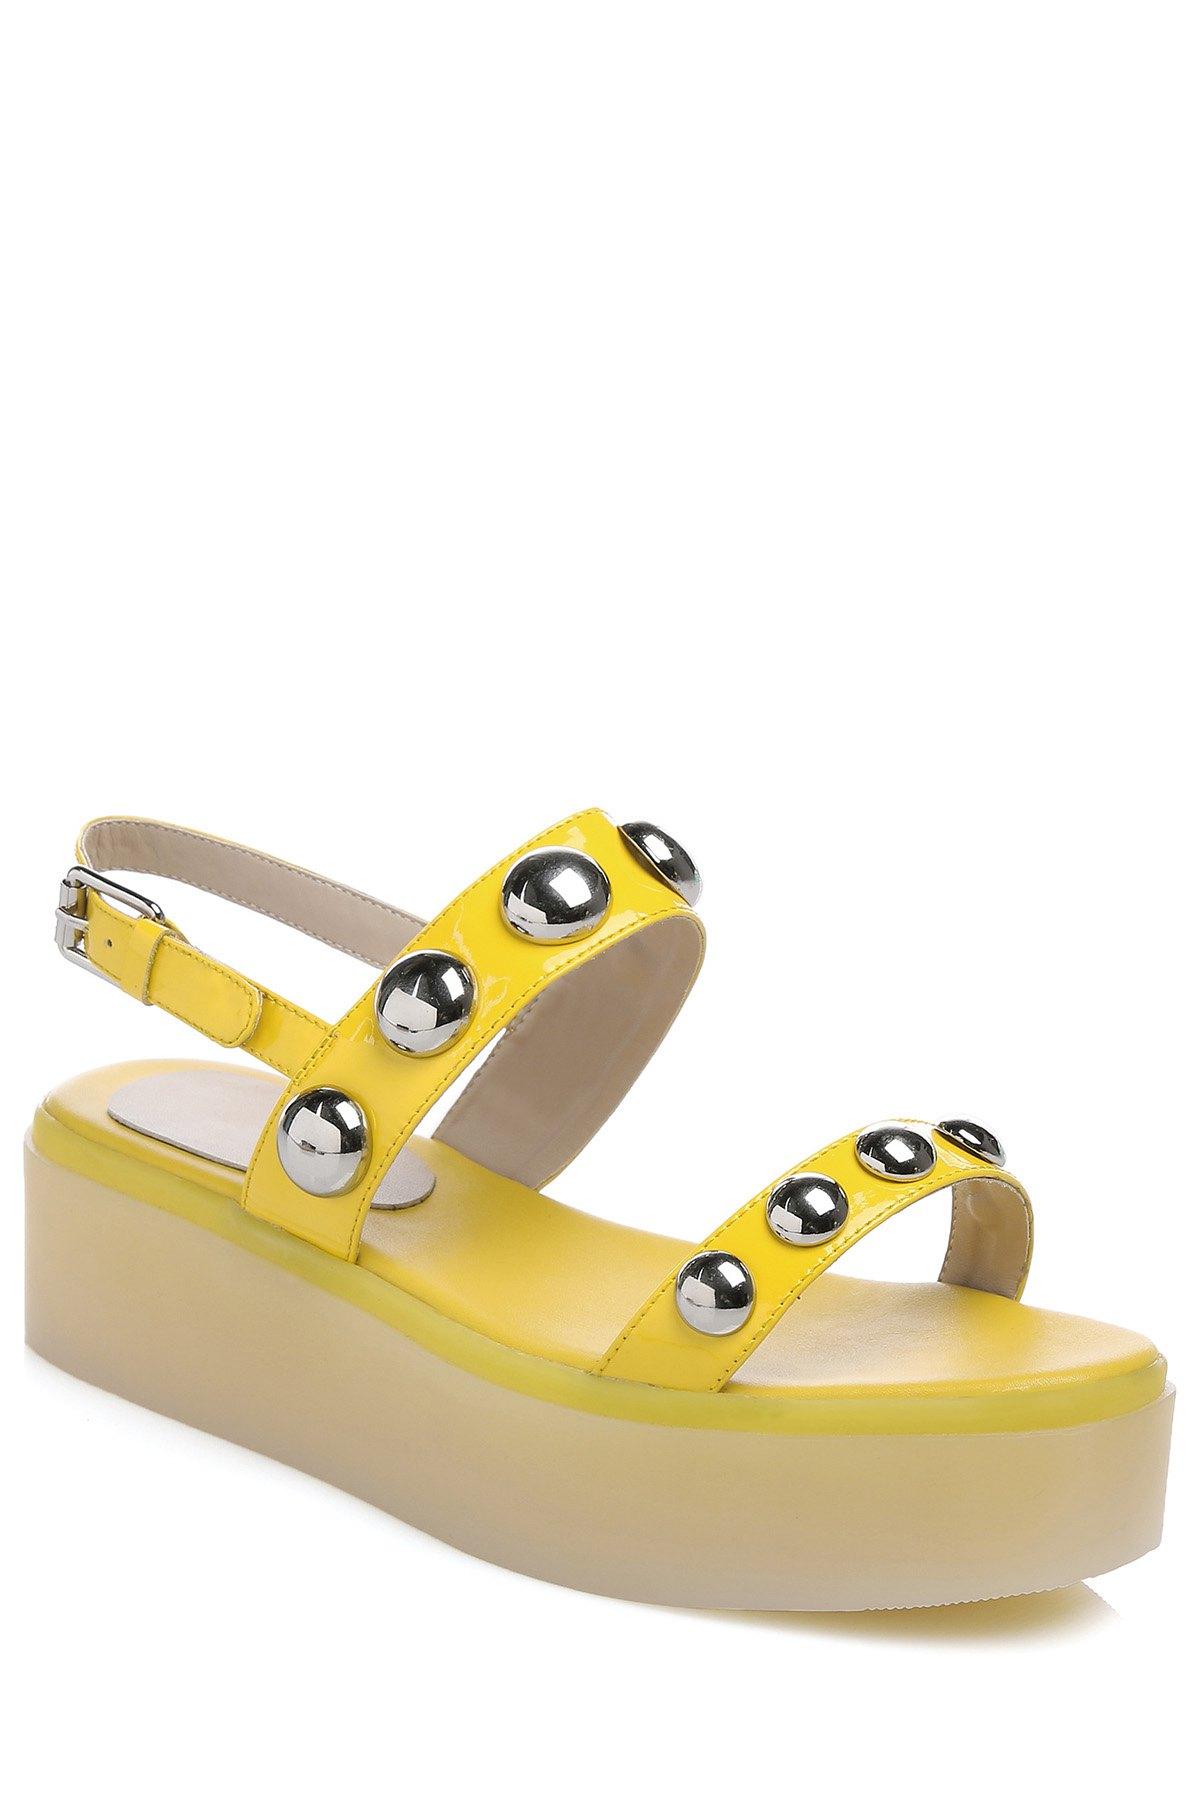 Buy Rivet Solid Color Platform Sandals YELLOW 35